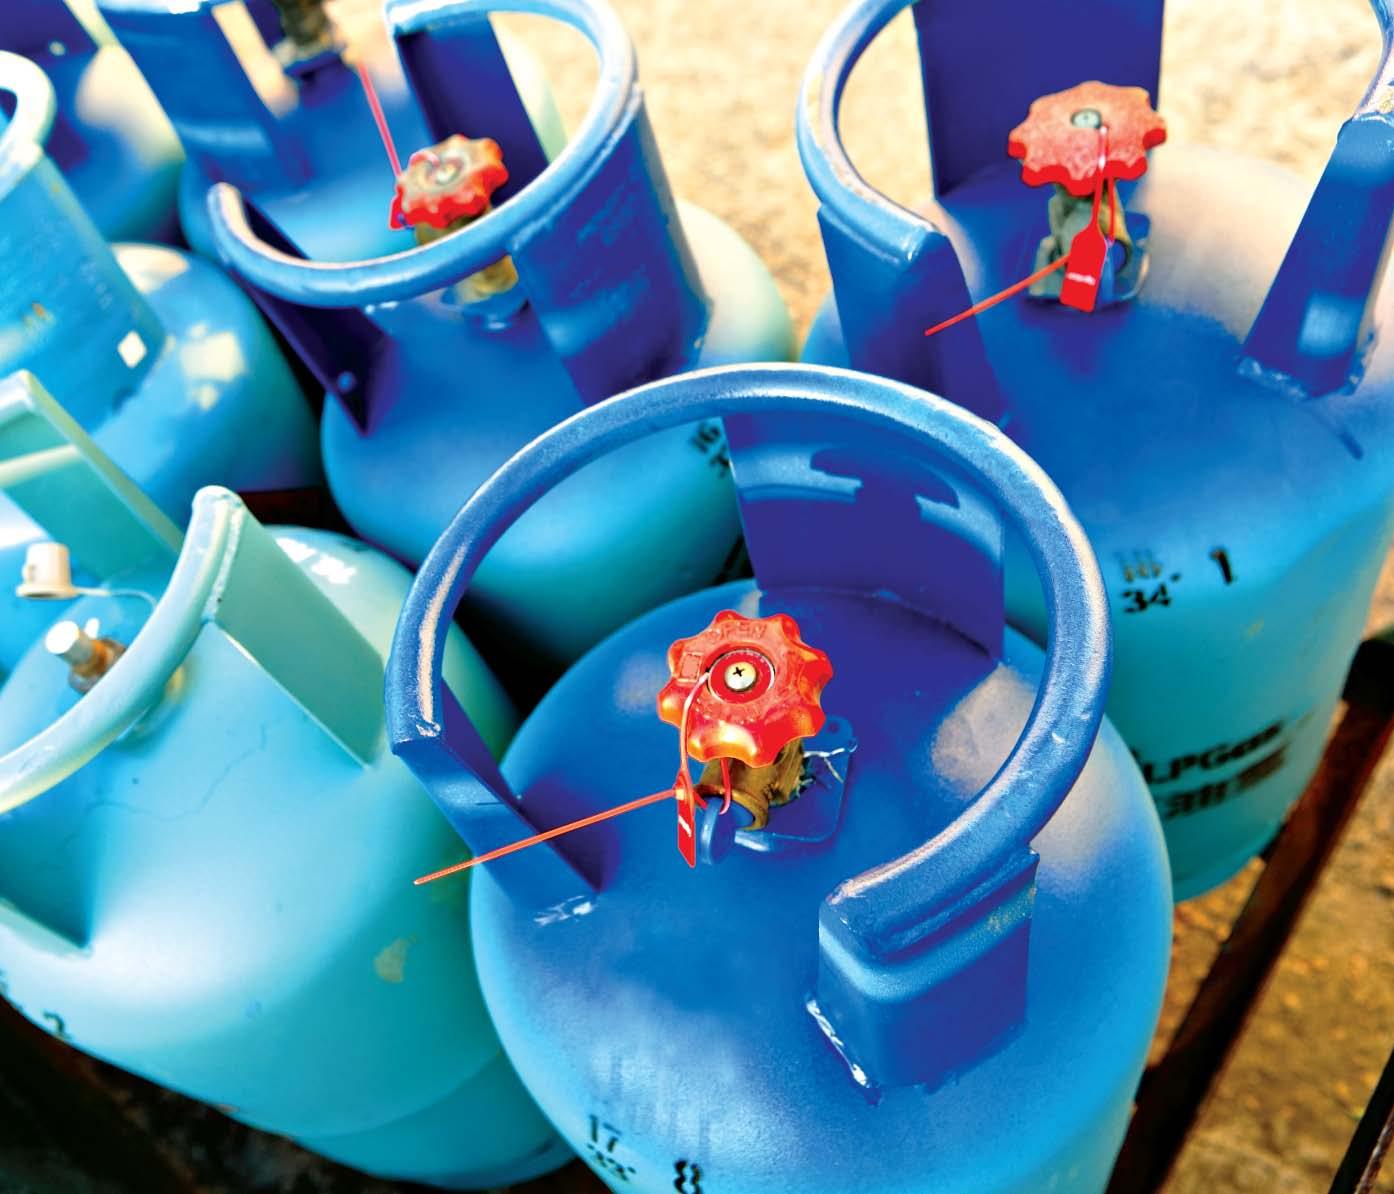 substandard fuel lpgap for curbing imports